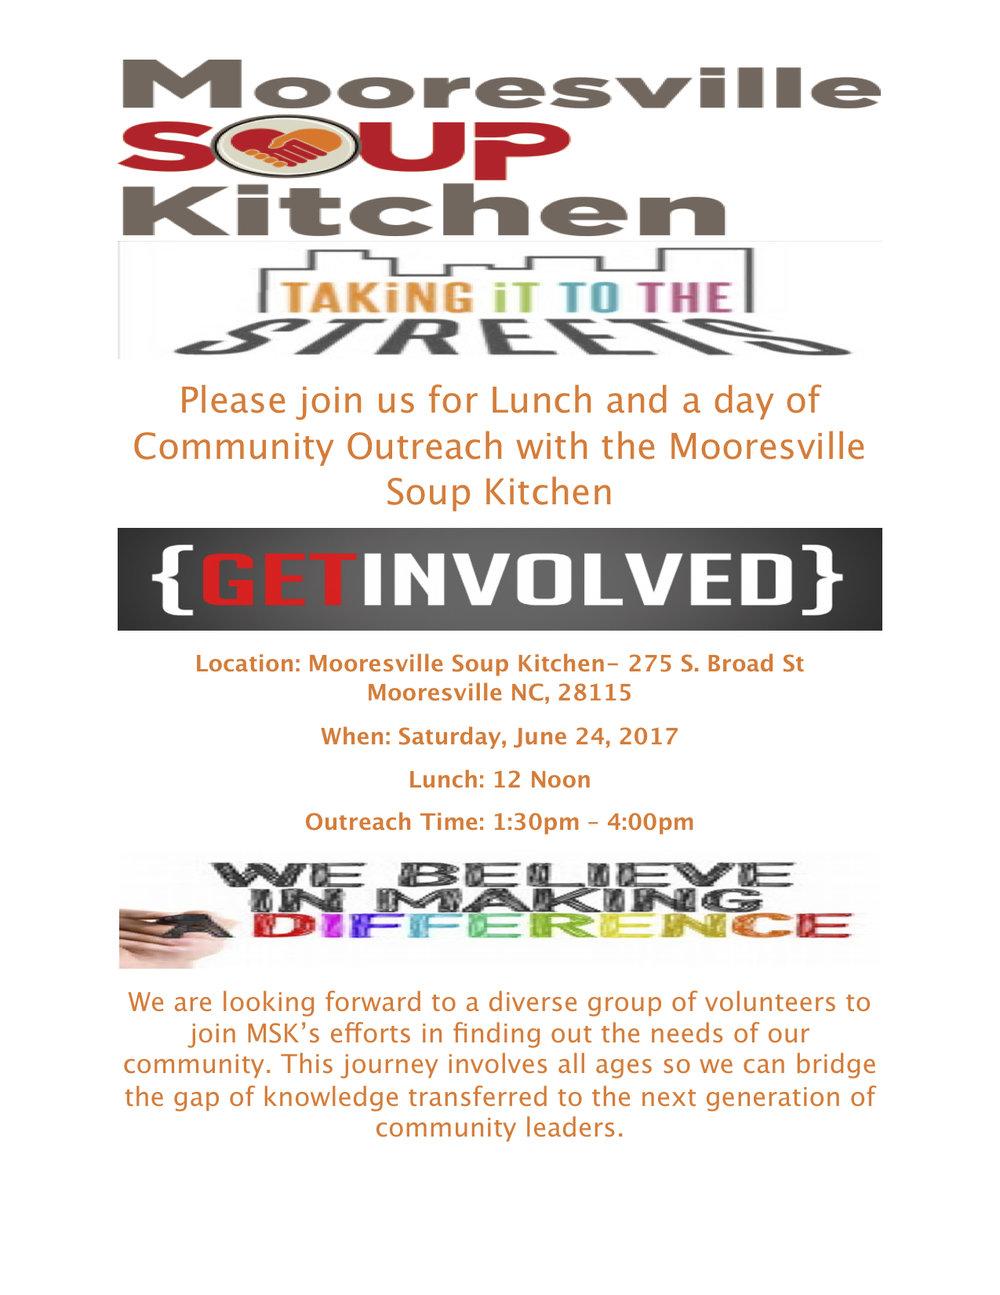 get involved flyer.jpg